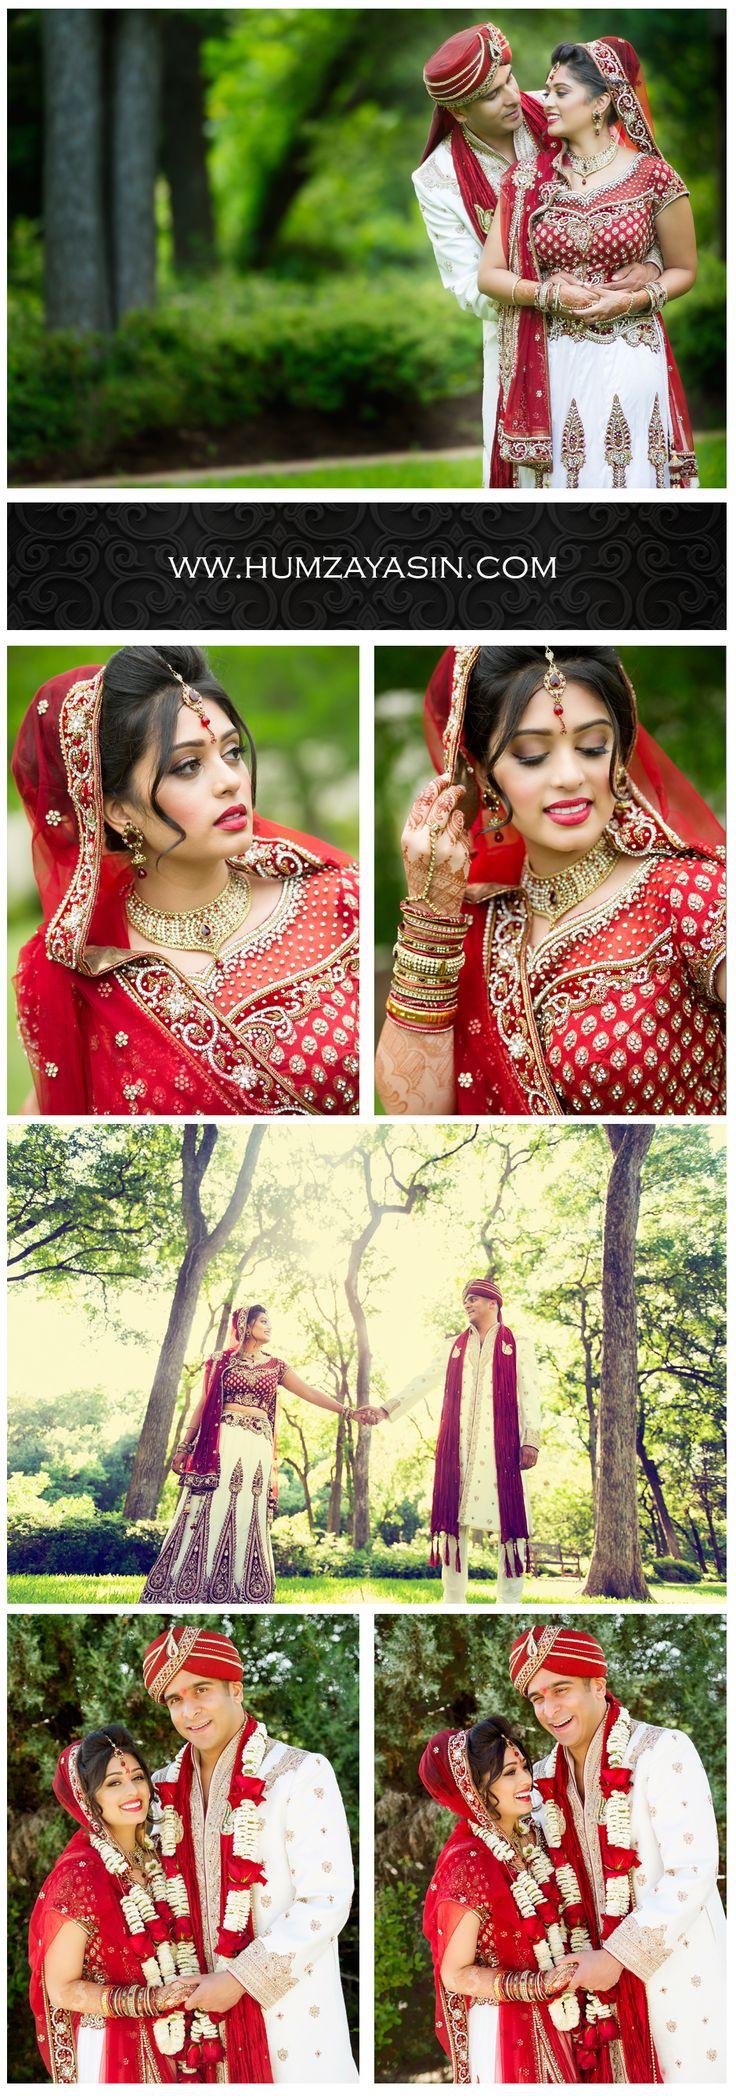 Couple and Bridal Portraits Photographed by Dallas Wedding Photographer Humza Yasin